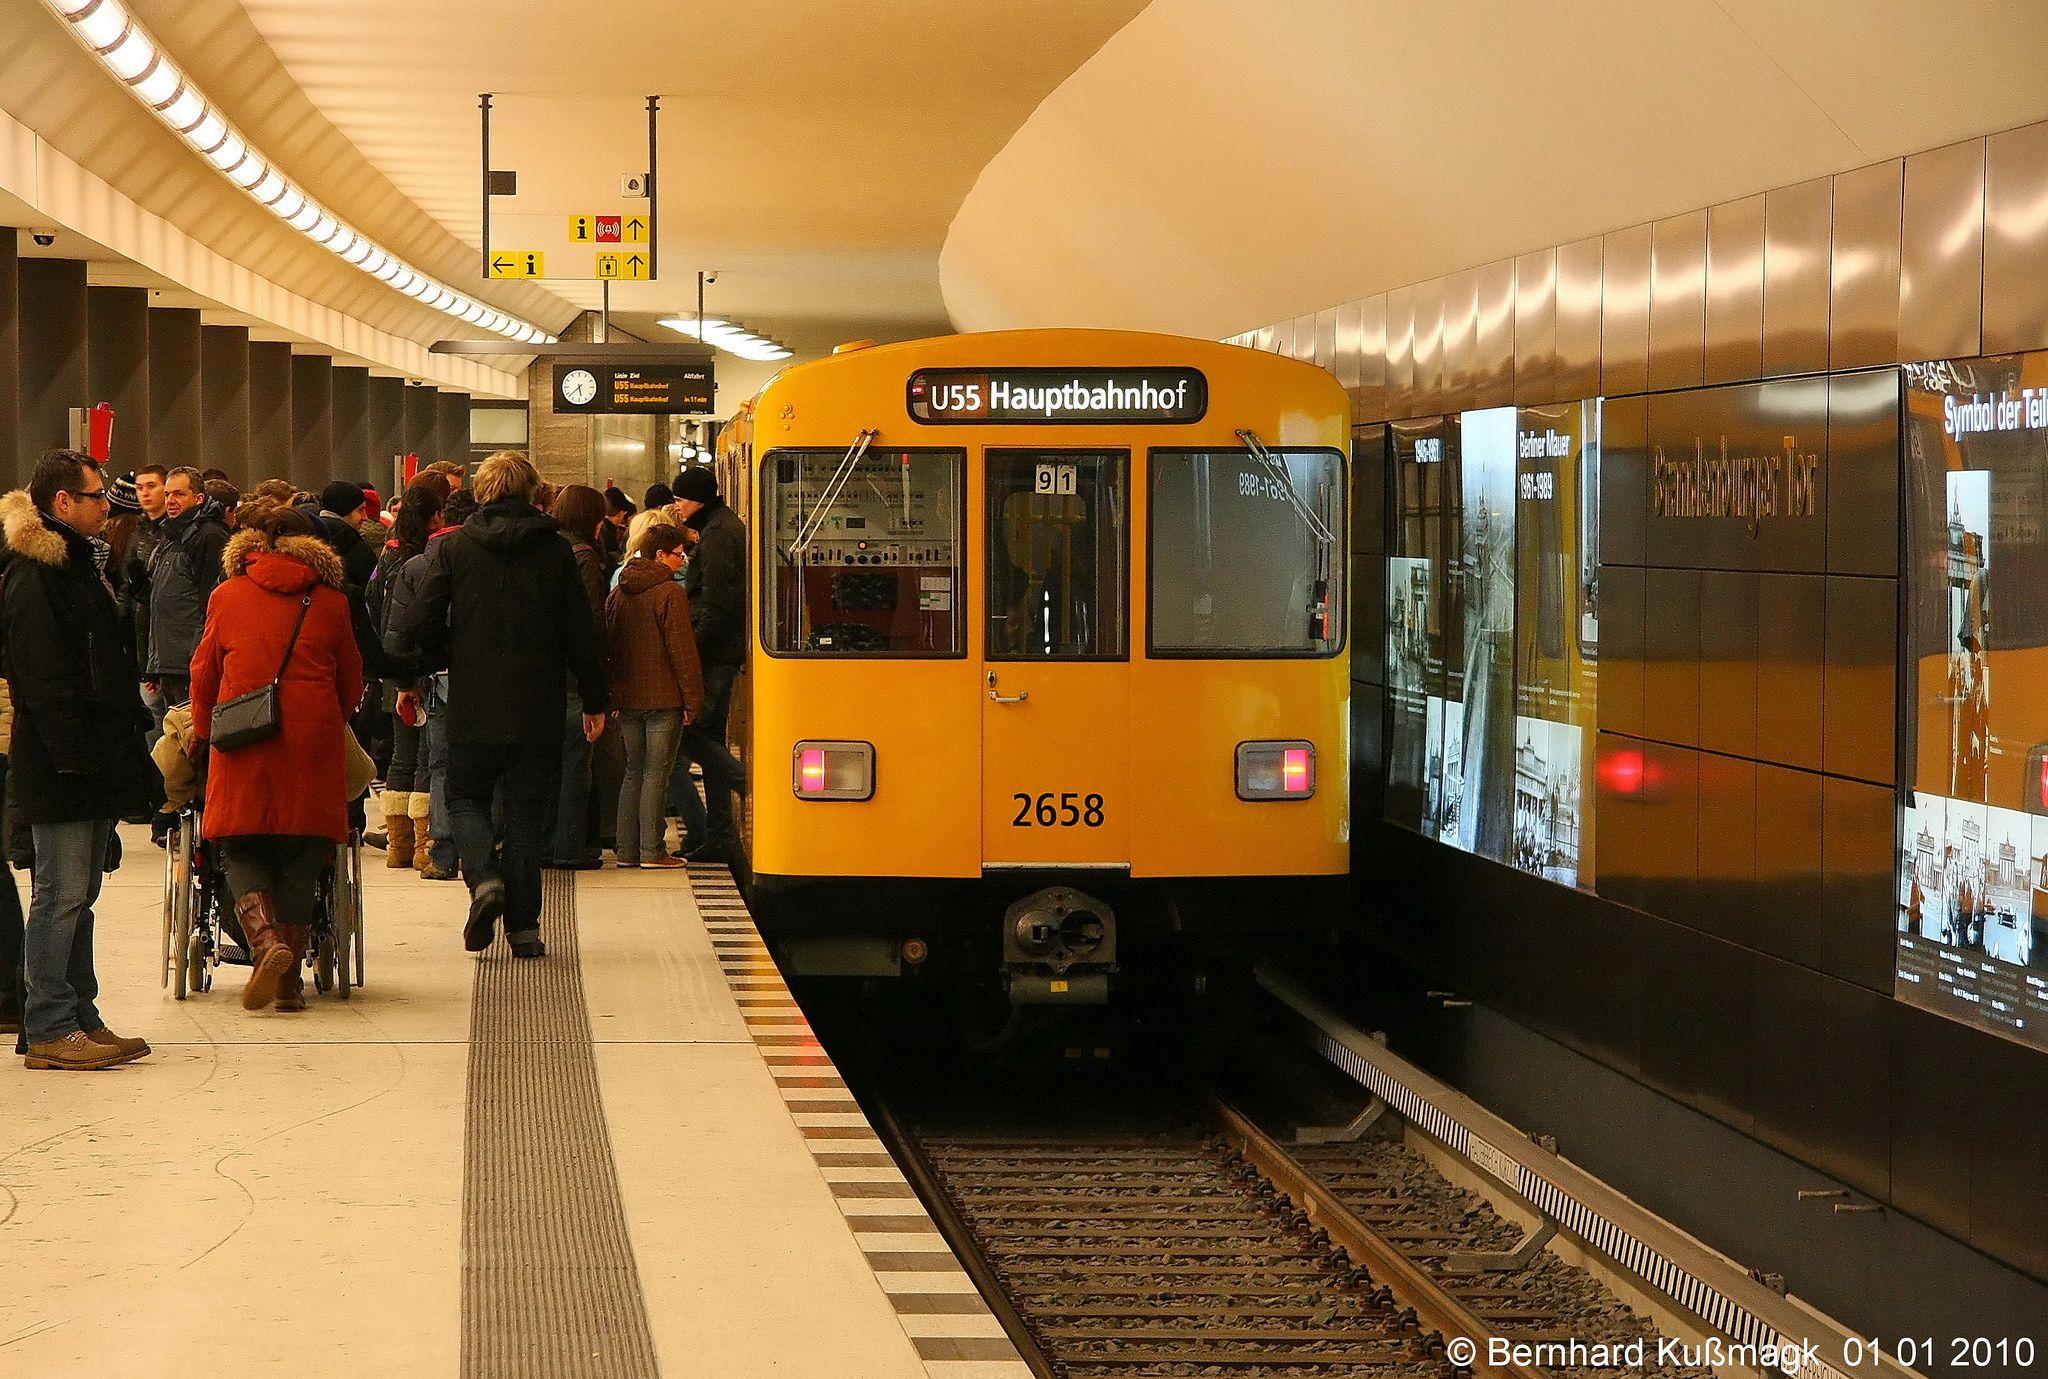 Europa Deutschland Berlin Mitte U Bahnhof Brandenburger Tor U55 Metro System Model Railroad Berlin